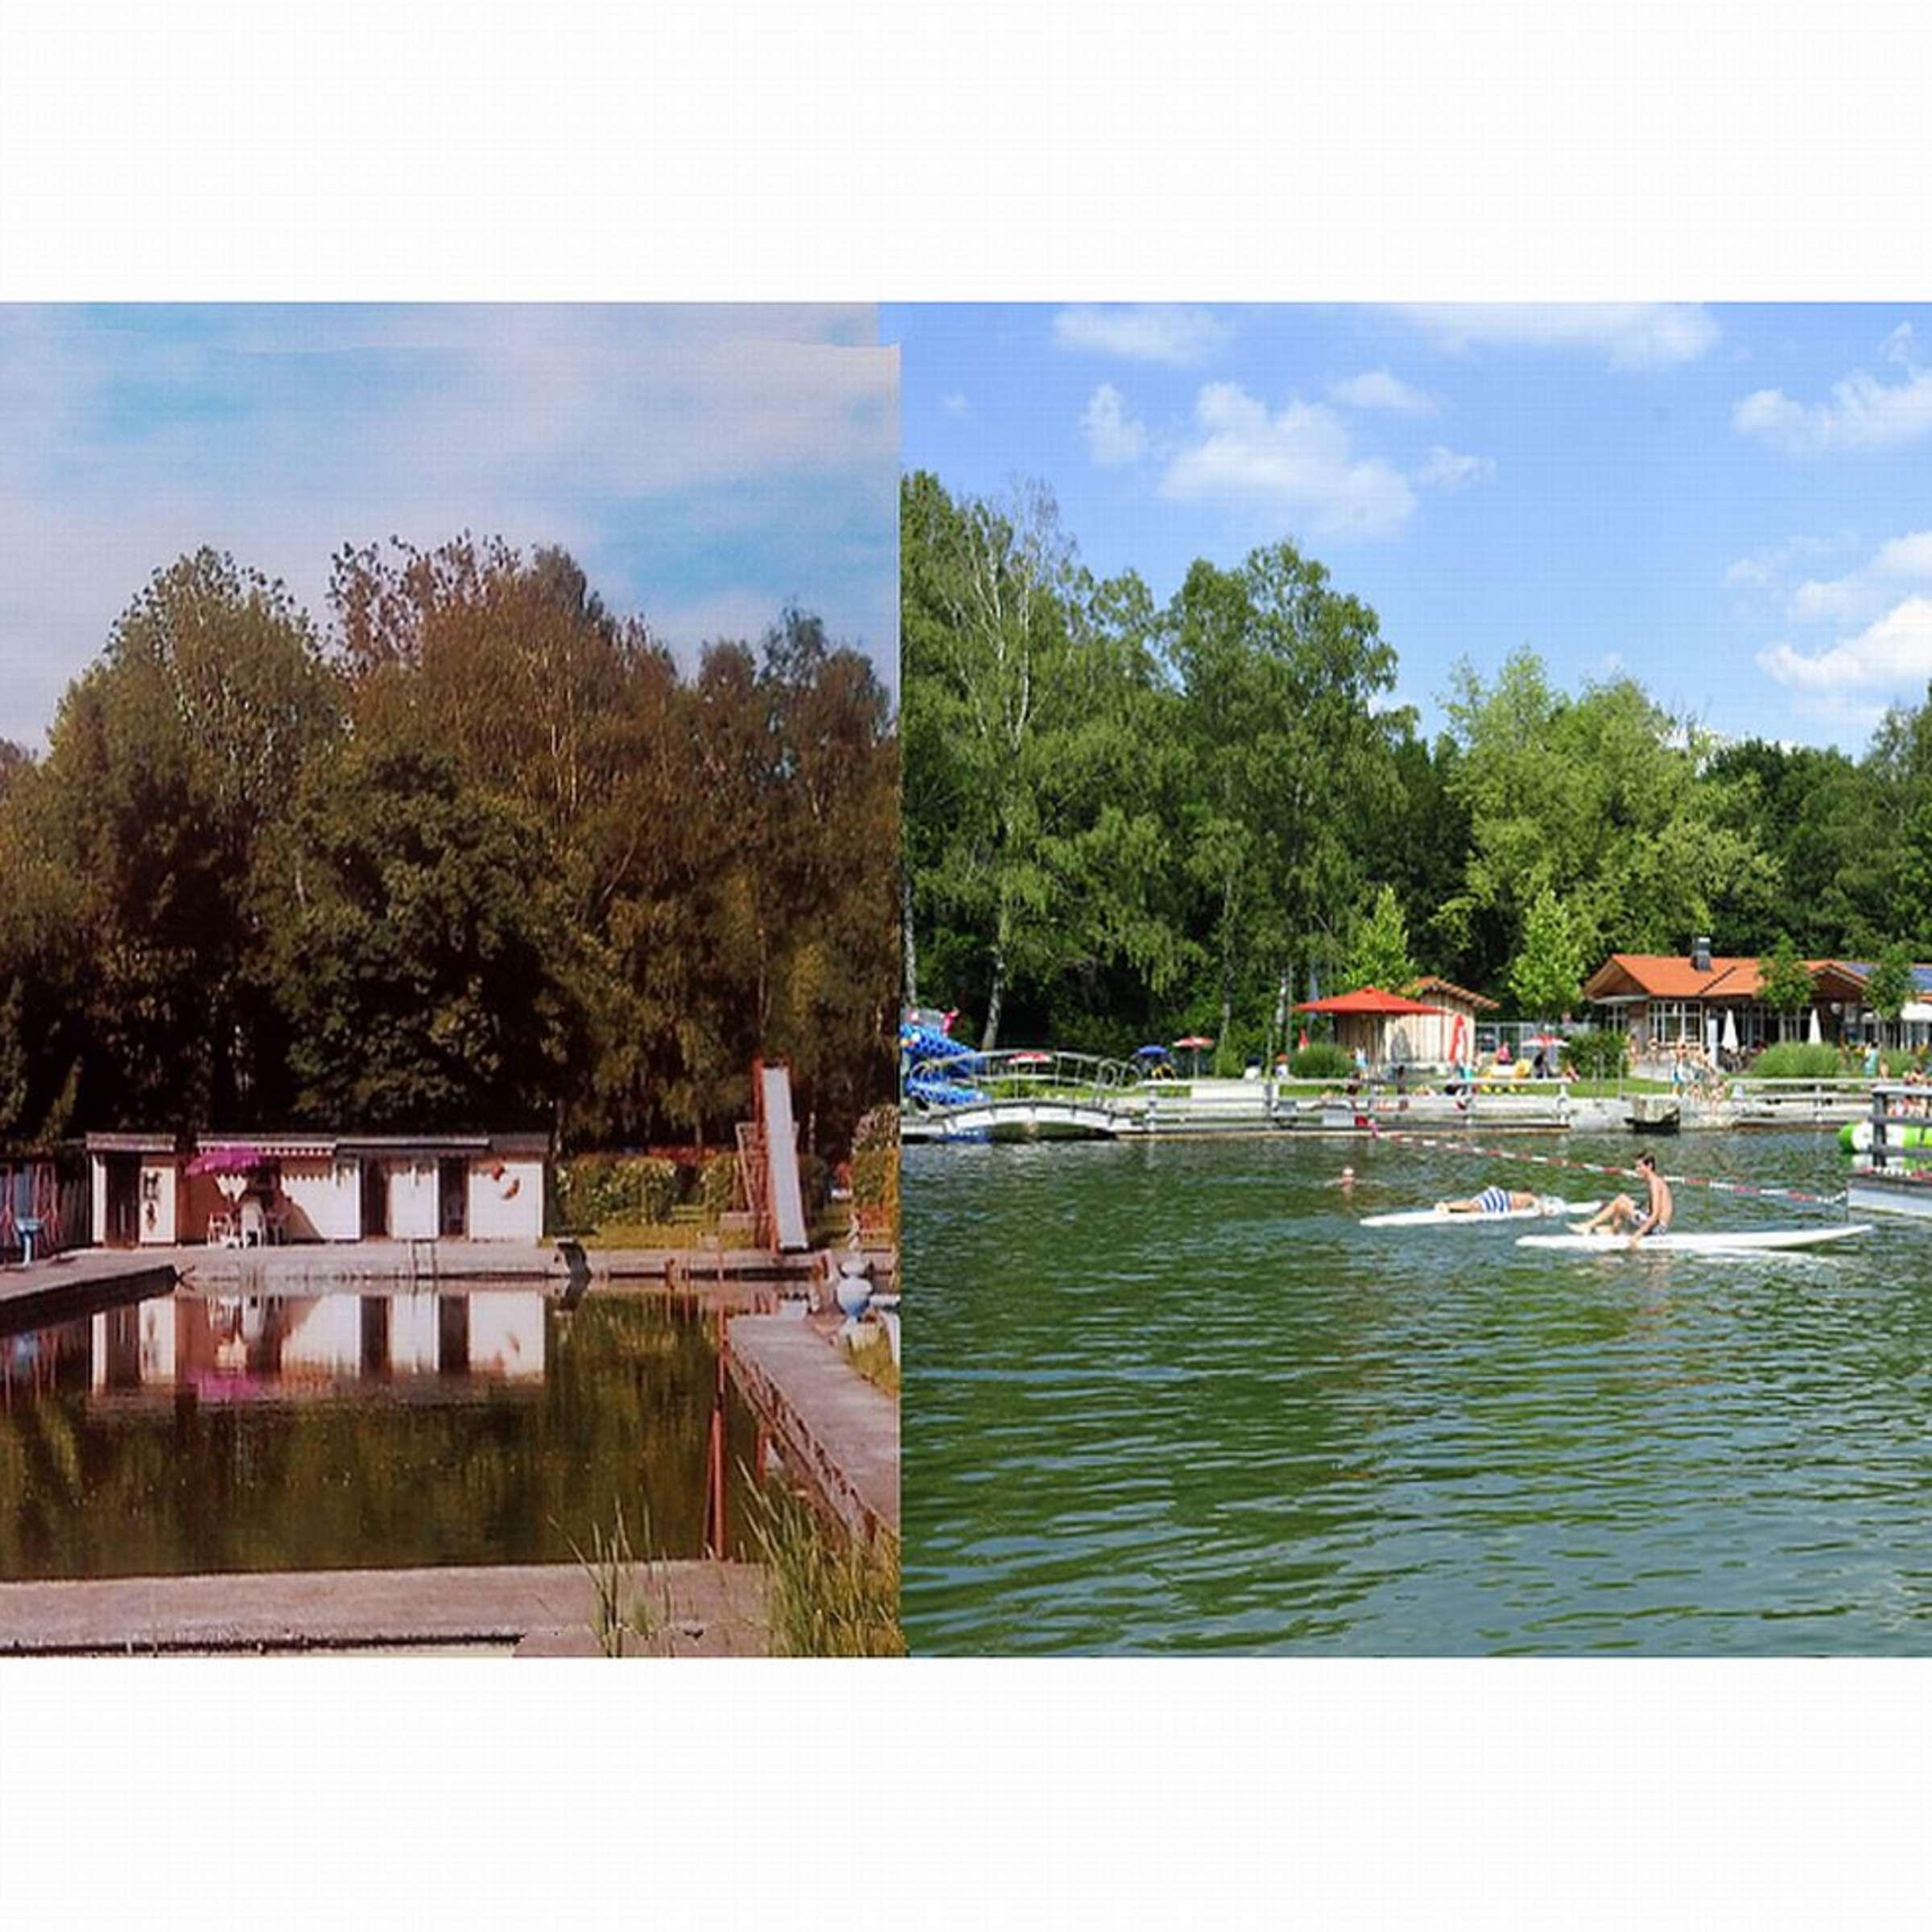 Oberhaching Naturbad Furth feiert Jubiläum   Oberhaching